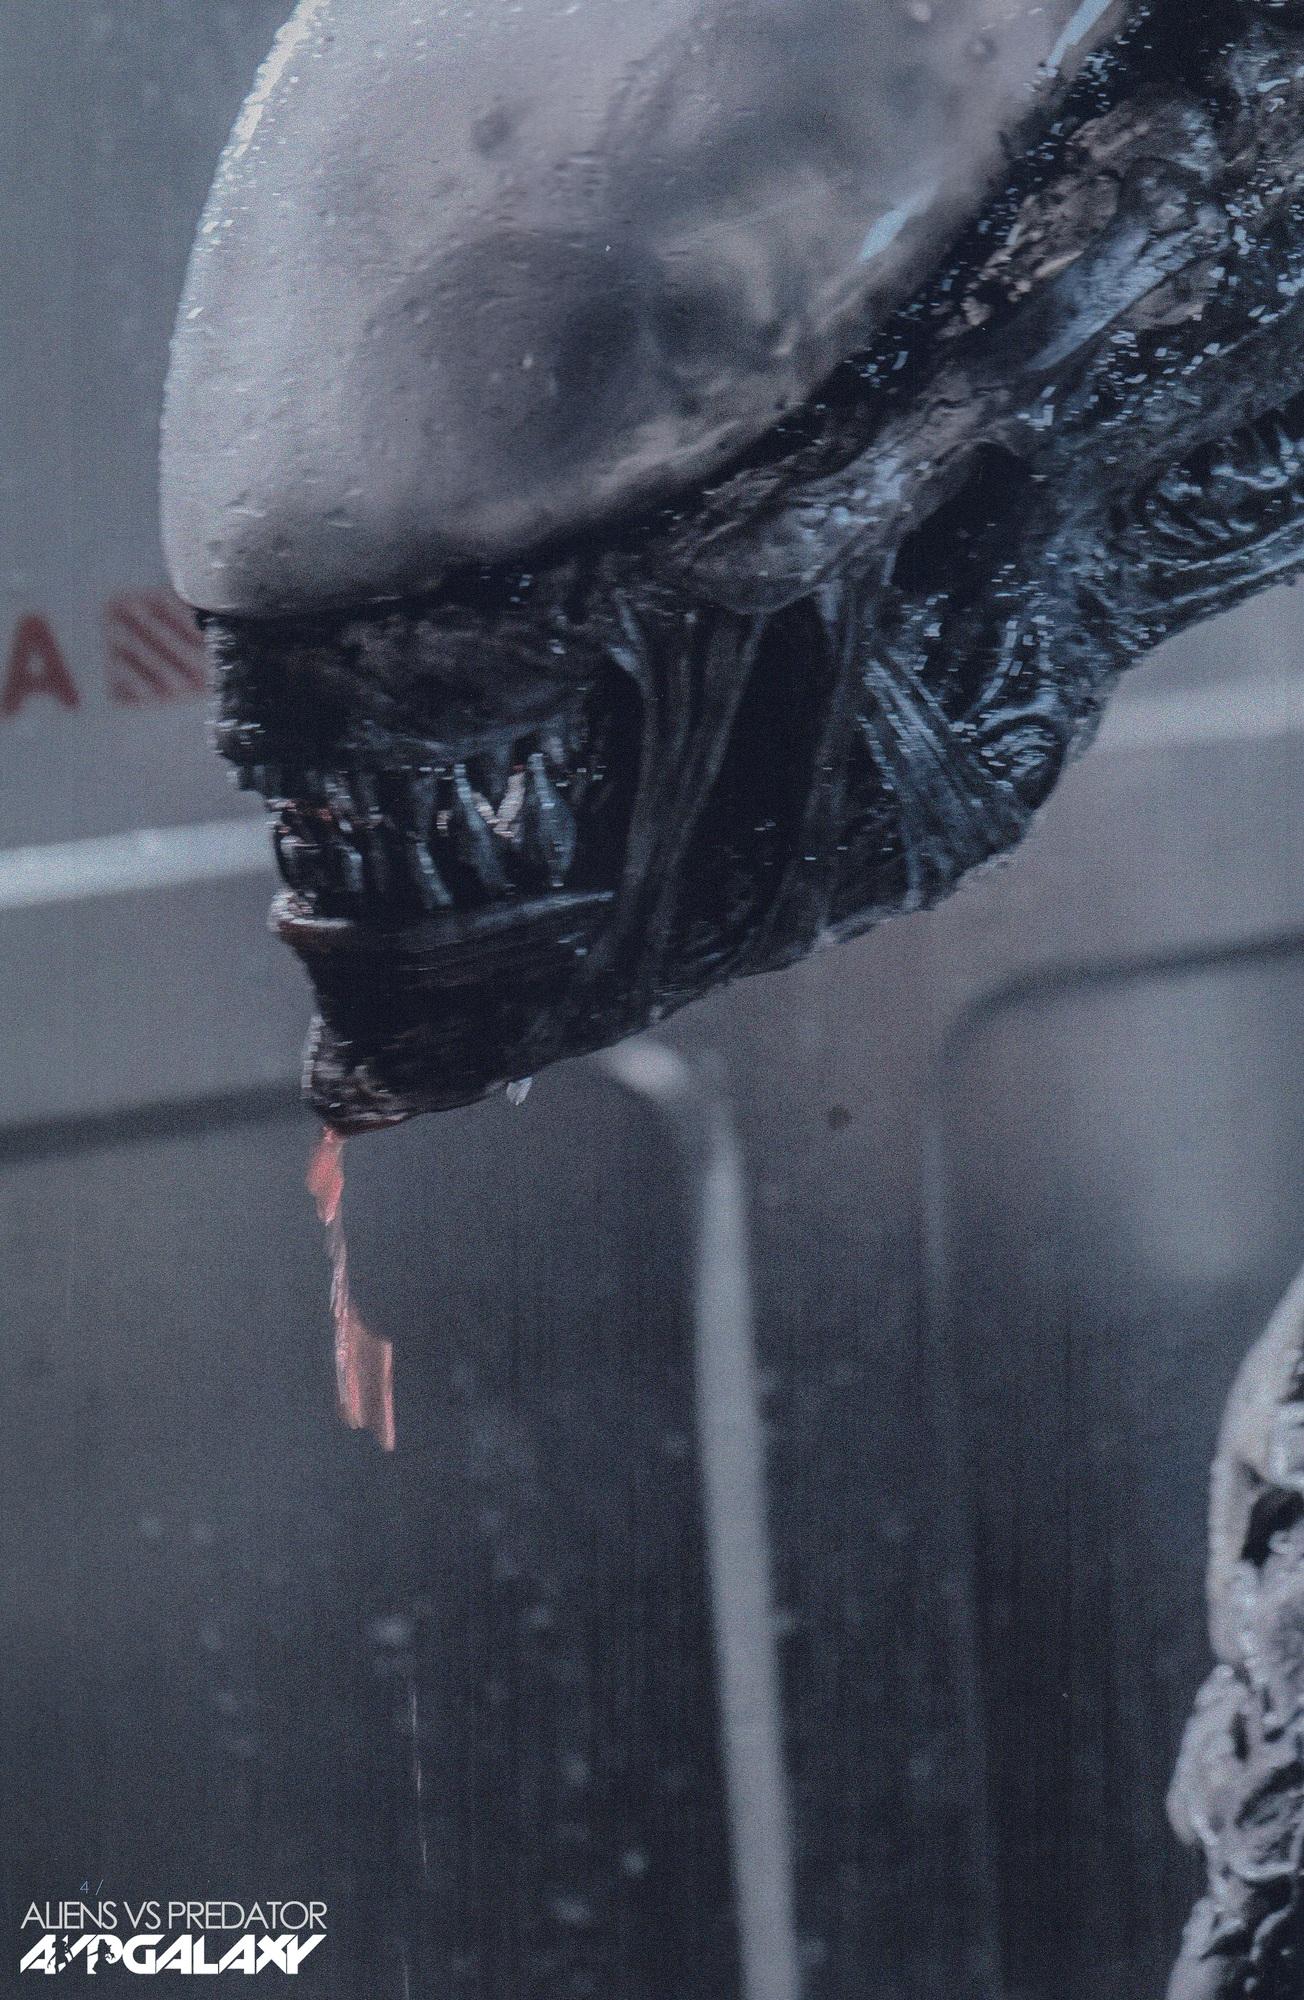 Alien The Covenant